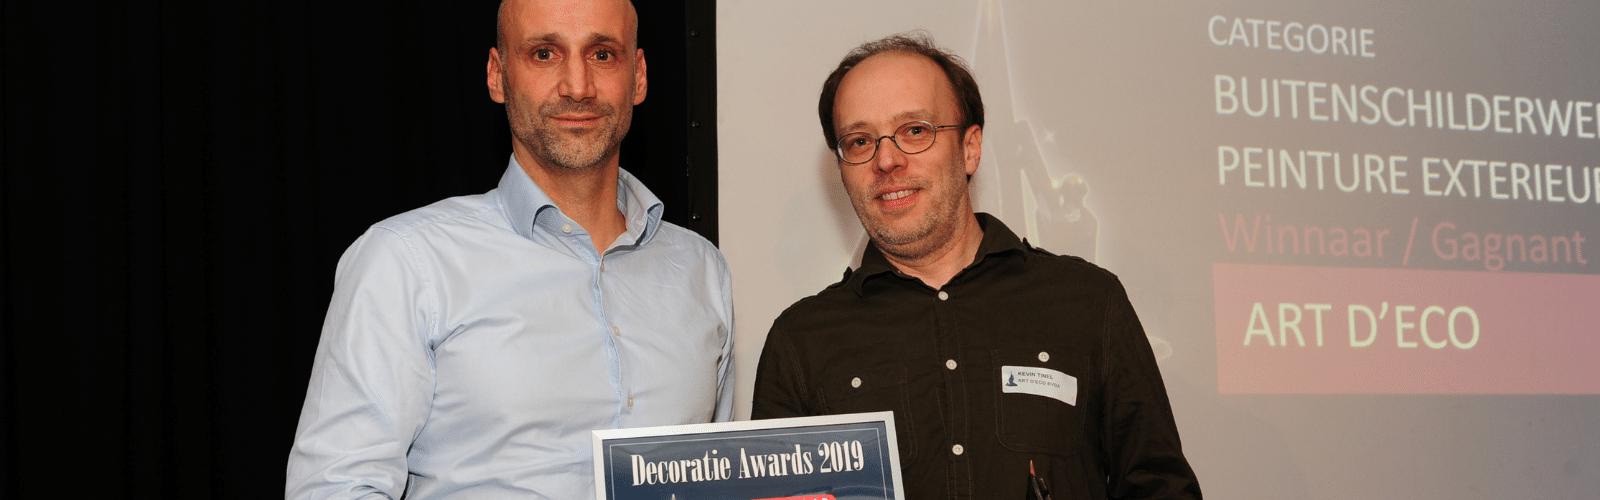 Decoratie Award 2019